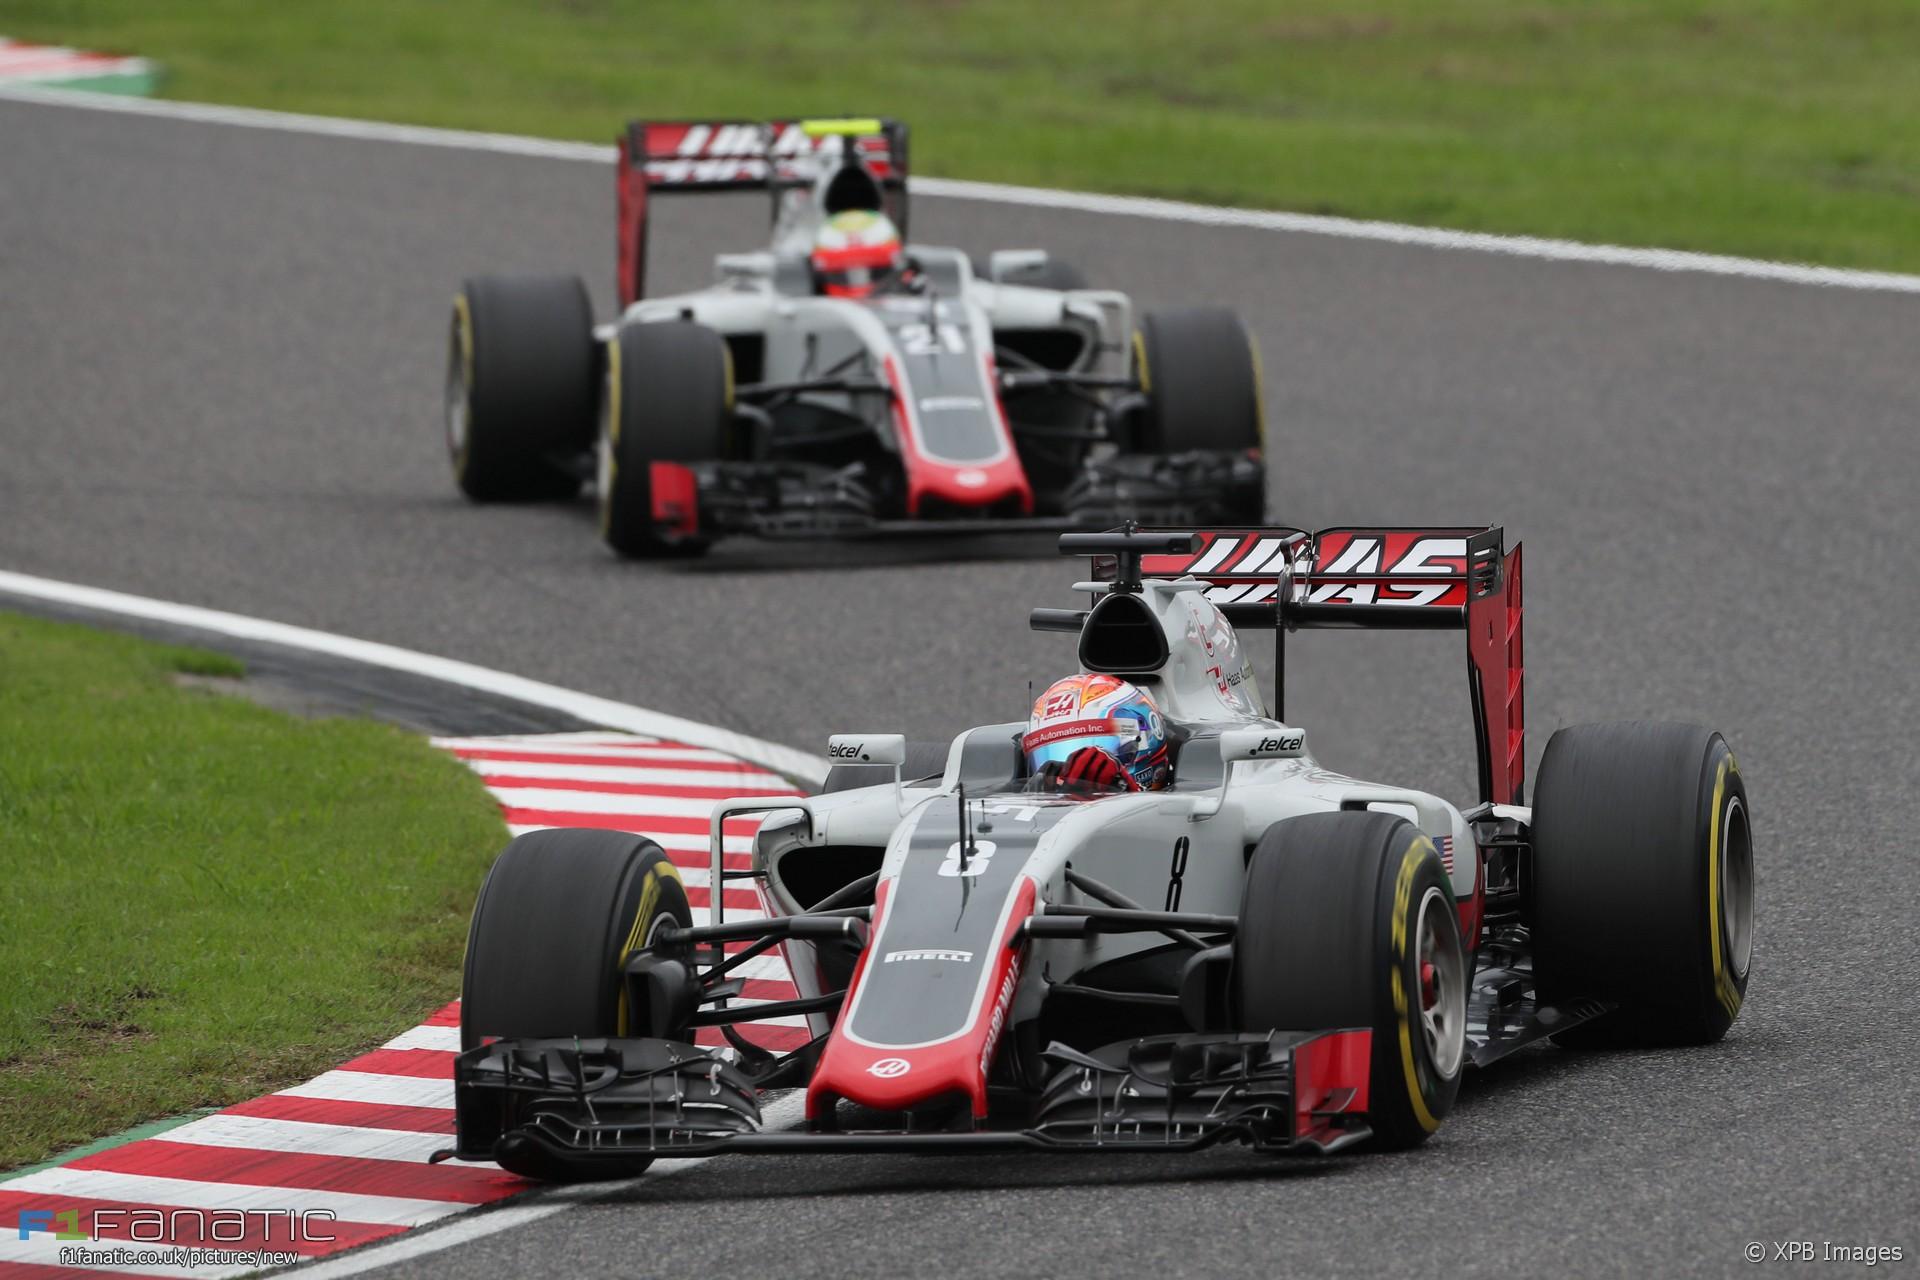 Romain Grosjean, Haas, Suzuka, 2016